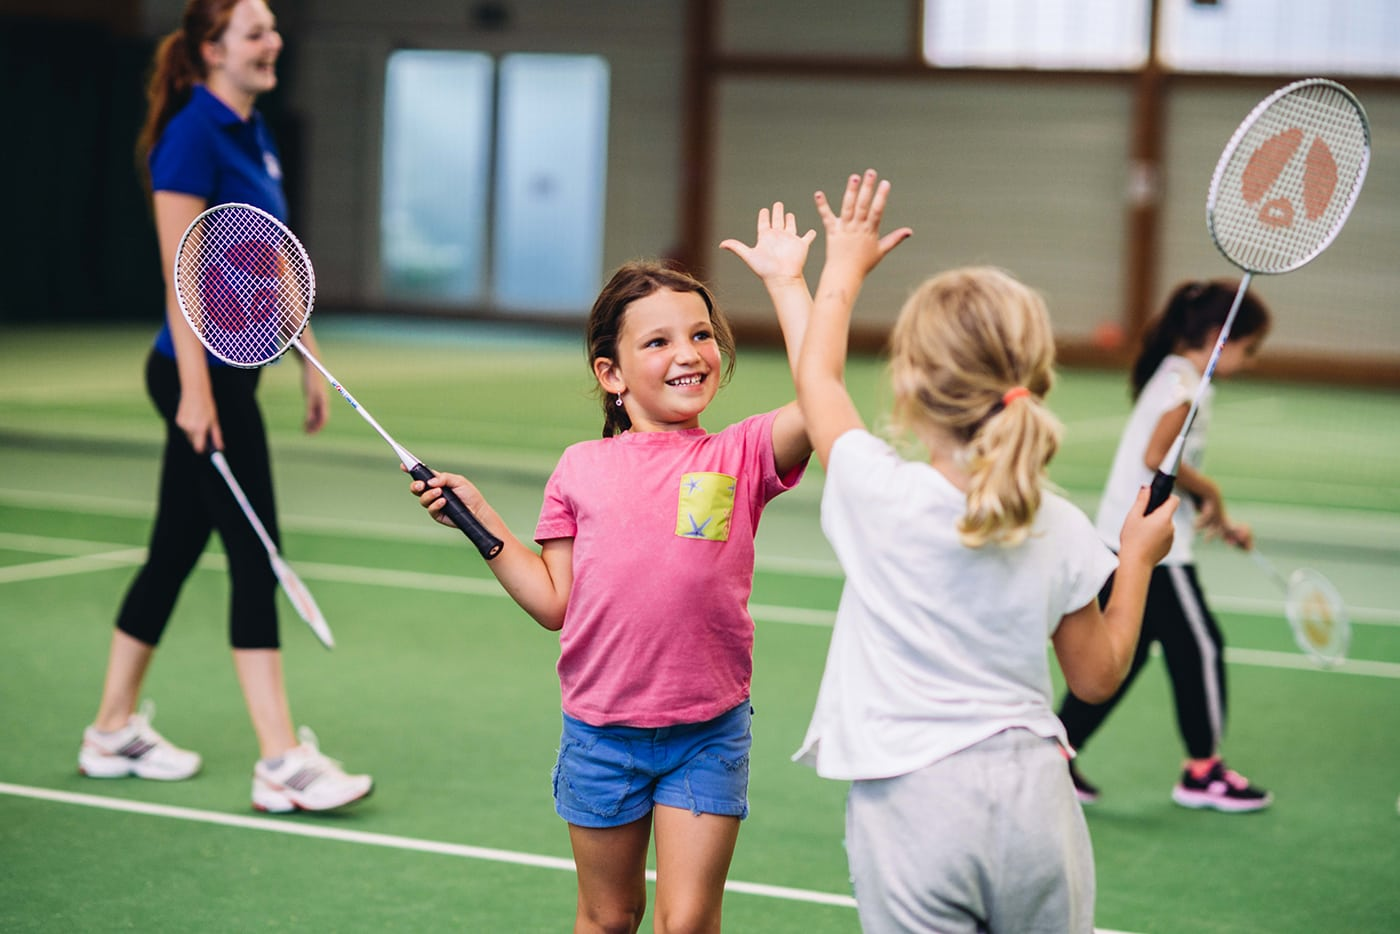 Kinder spielen Badminton in Sport Arena